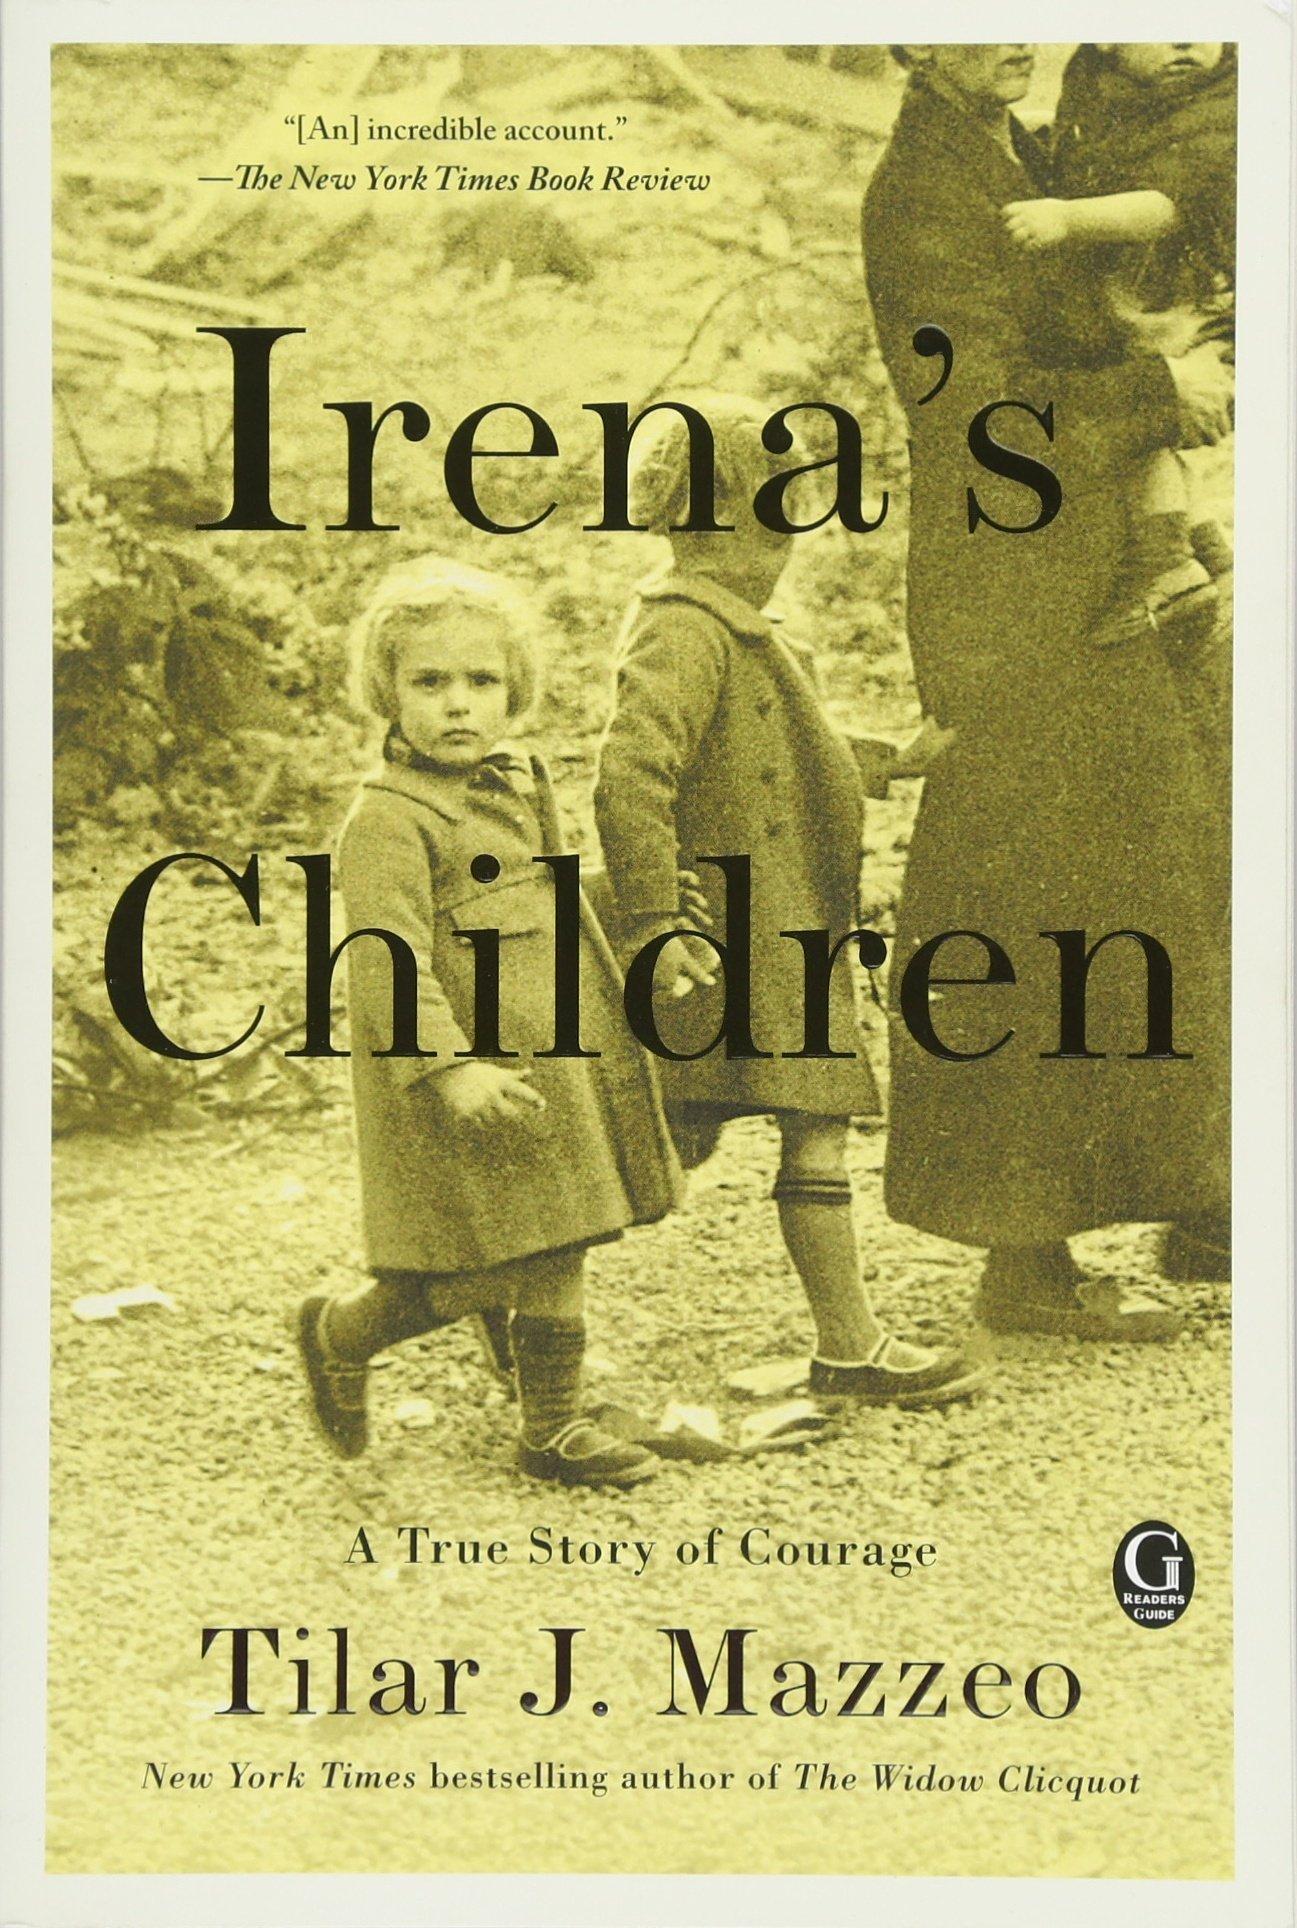 Image result for irena's children